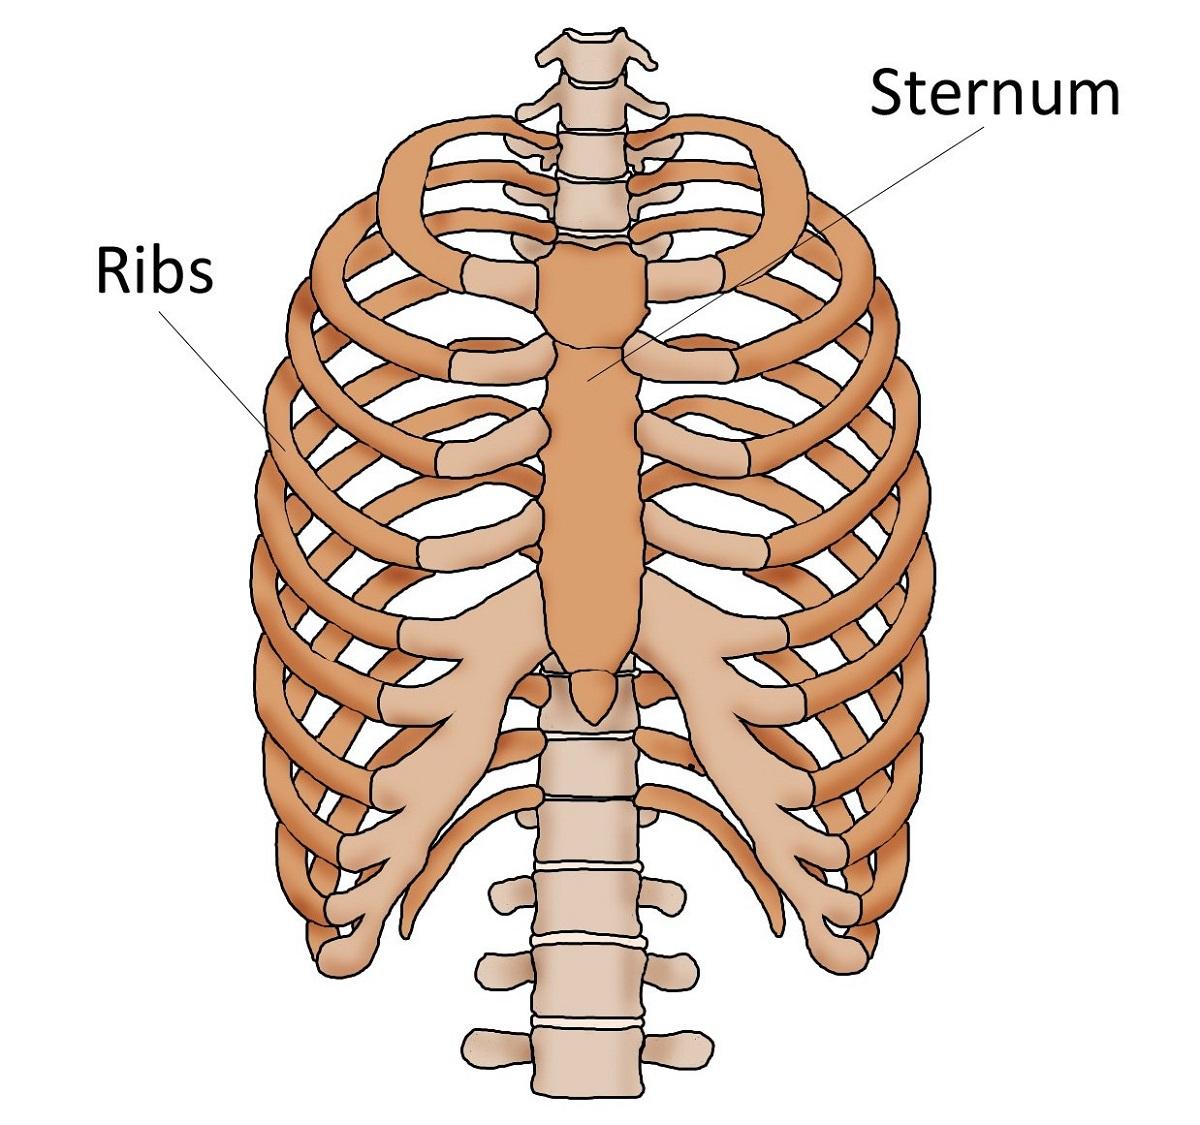 Human body organ diagram ribs